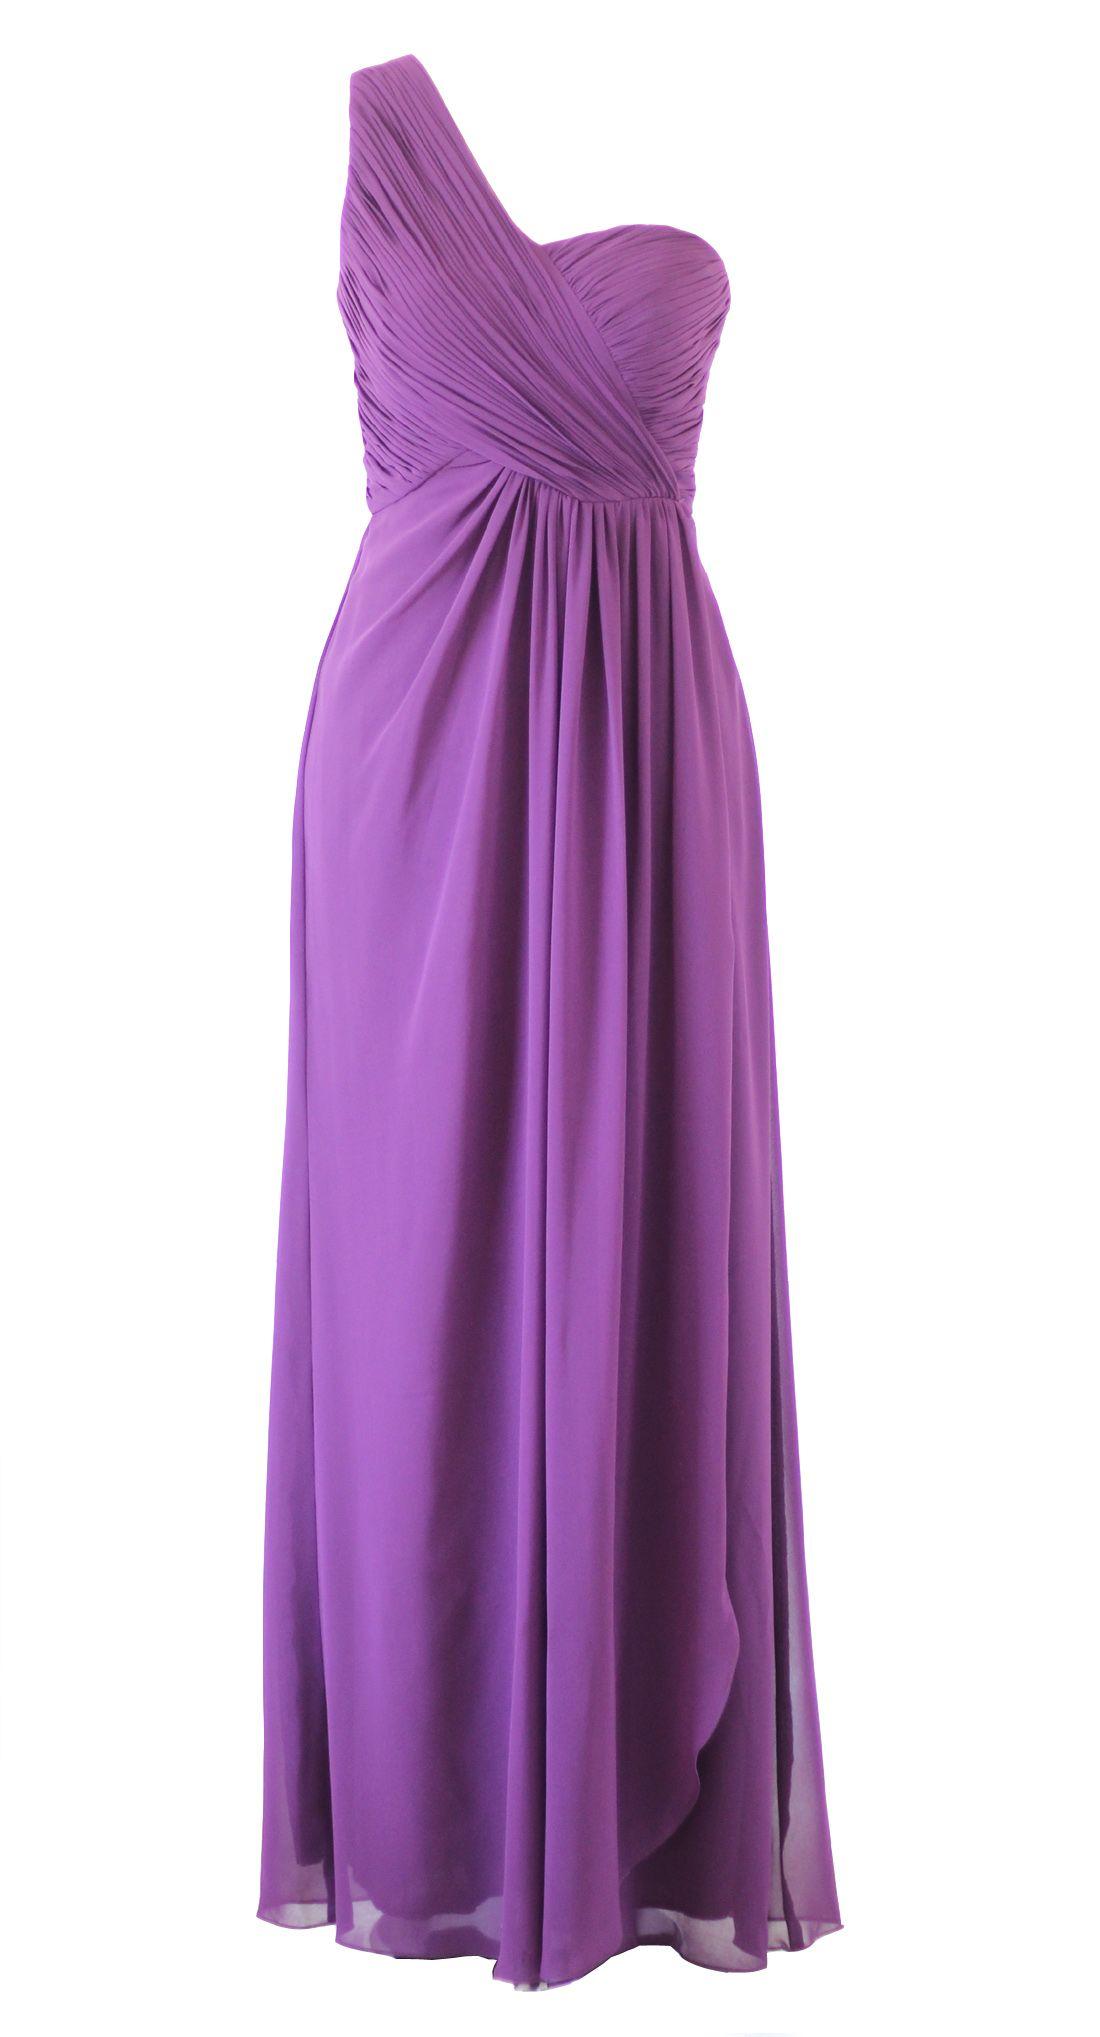 Faship Faship Womens Elegant One Shoulder Pleated Long Formal Dress Dark Purple 12 Dark Purple Walmart Com Formal Dresses Formal Dresses Long Formal Dresses Long Elegant [ 2037 x 1100 Pixel ]